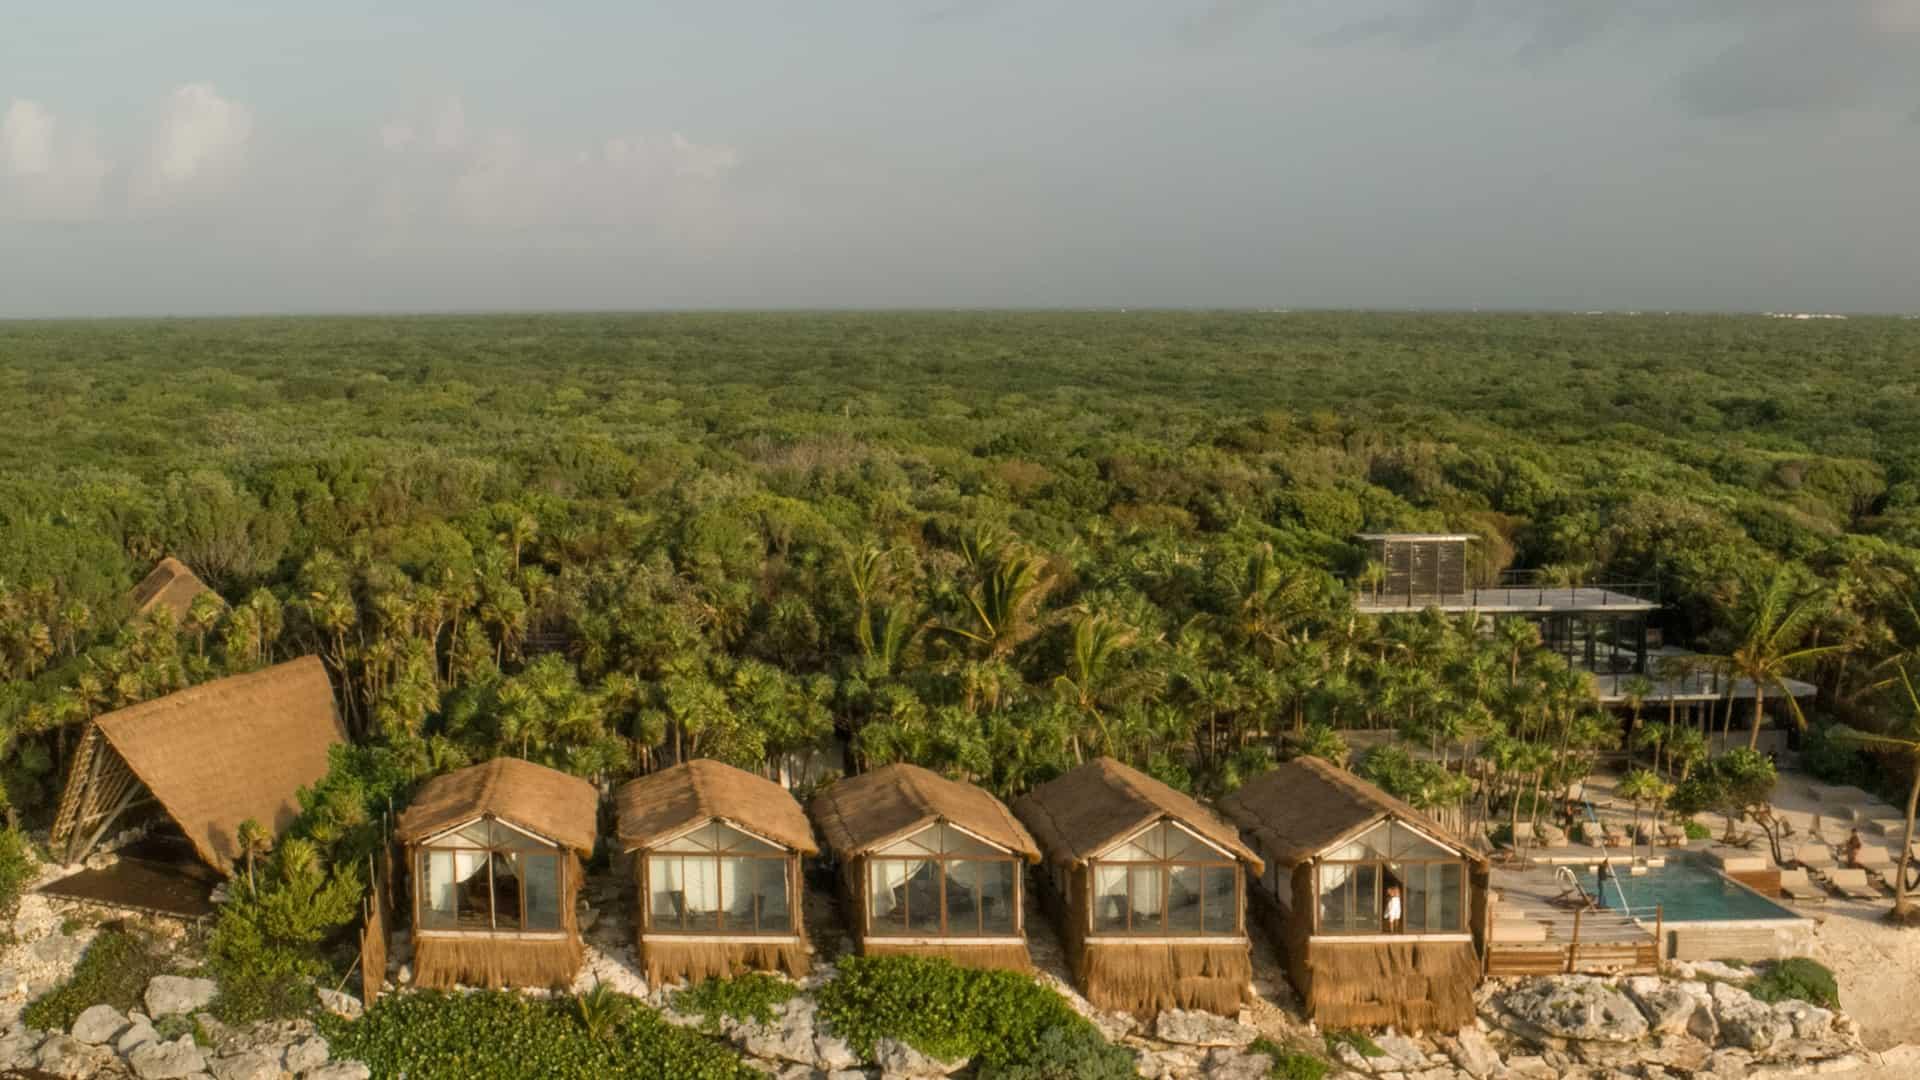 Habitas-Tulum-review-drone-overview